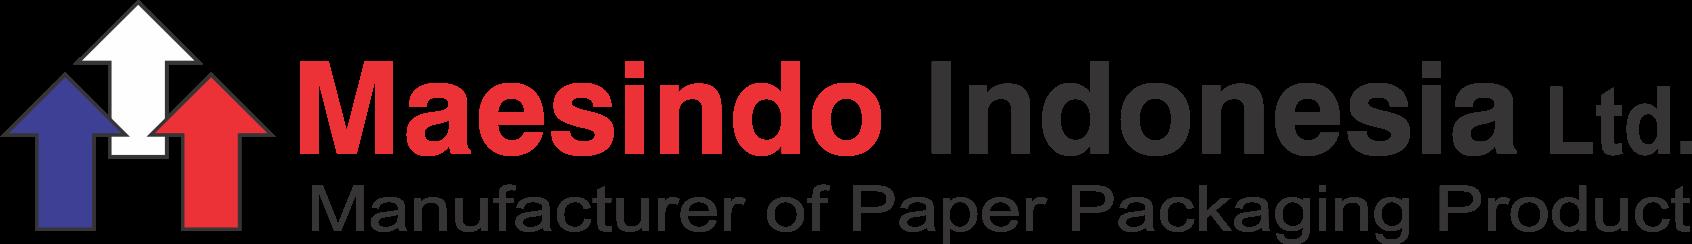 Maesindo Paper Packaging